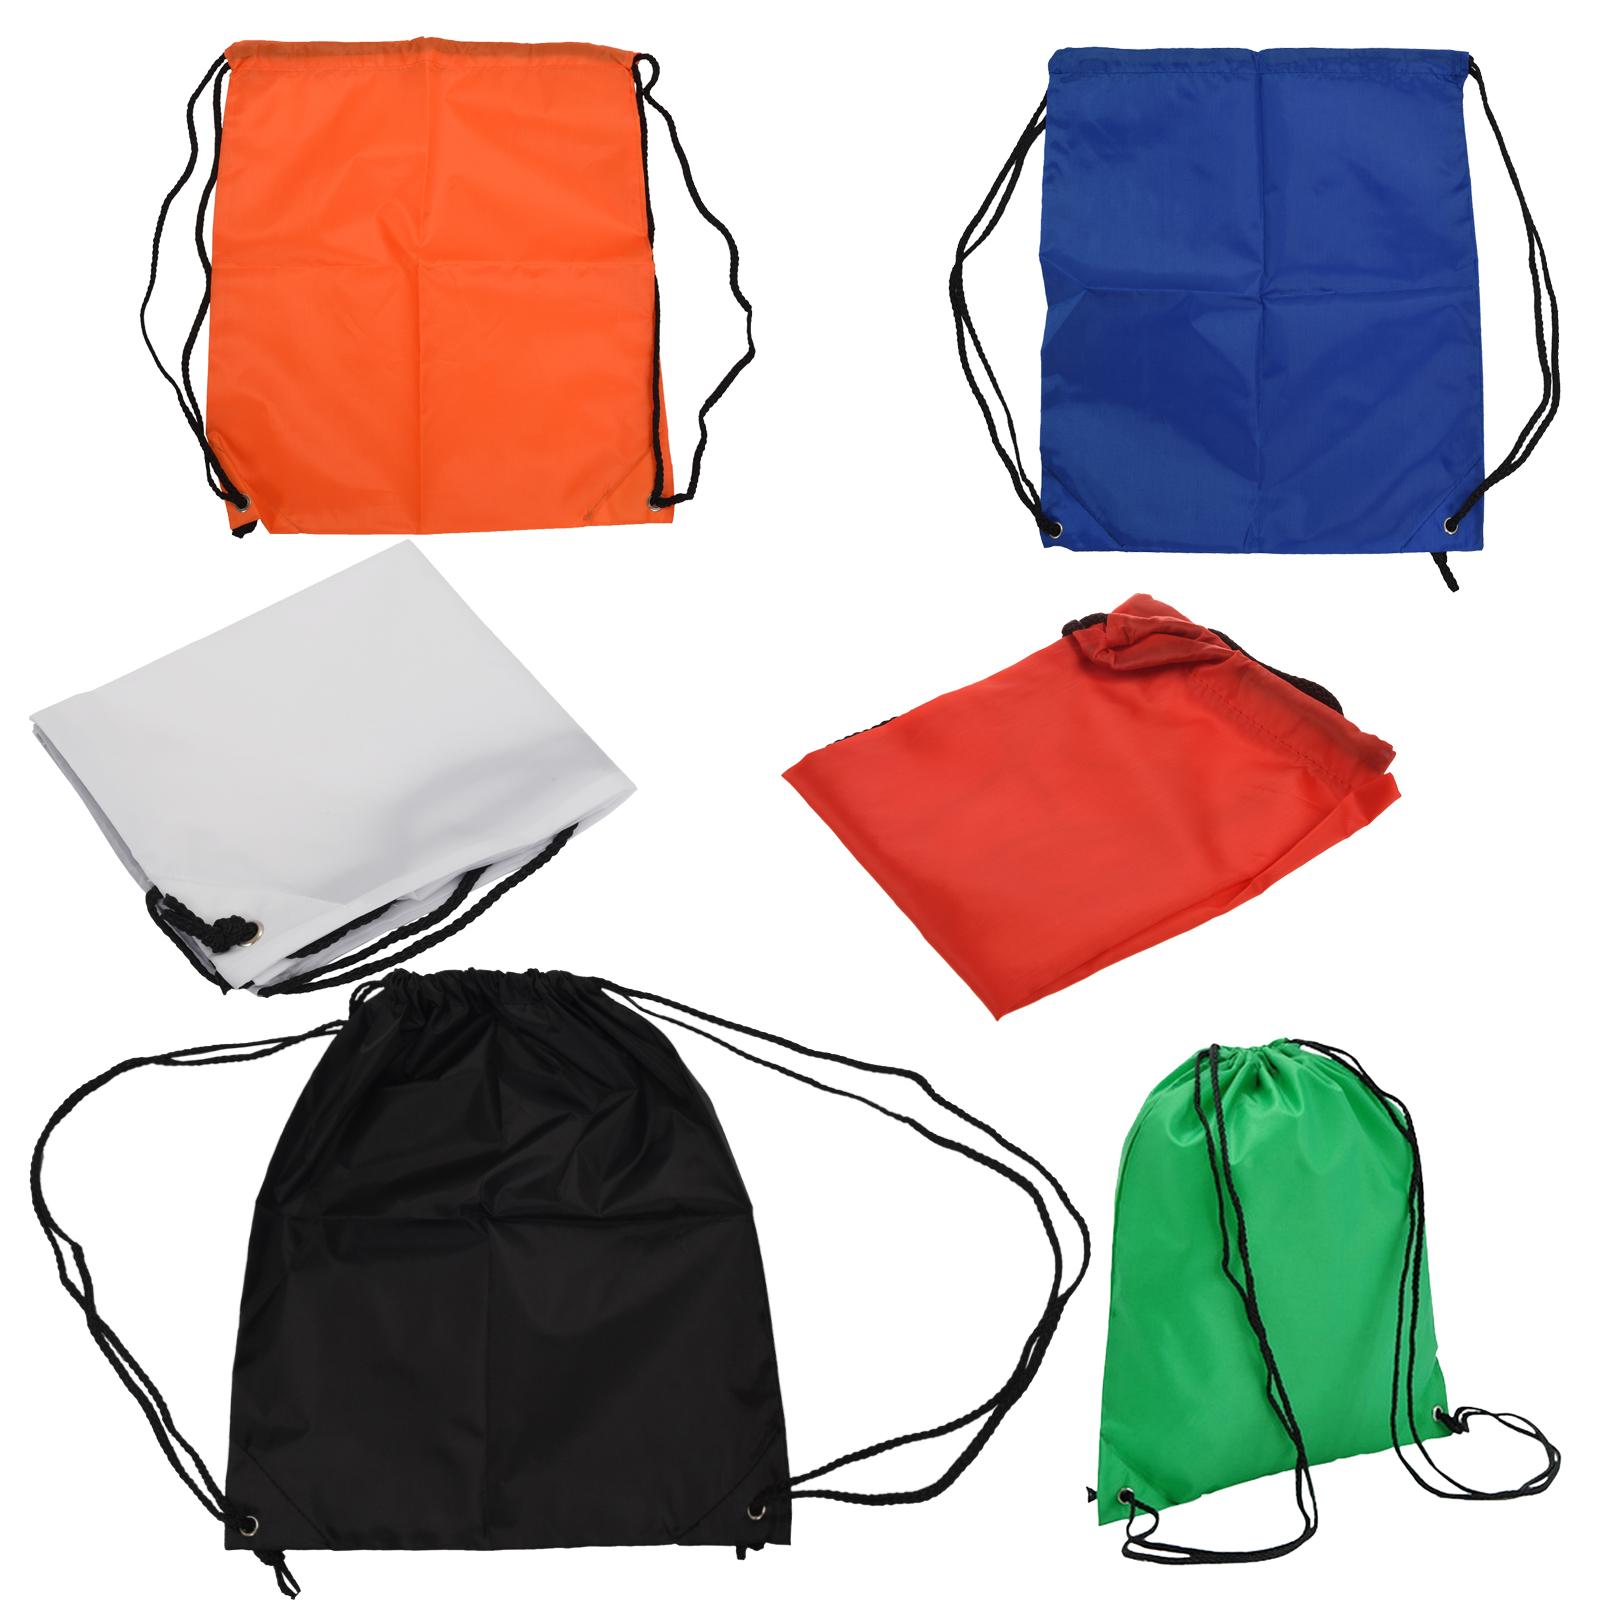 1X(School Drawstring Book Bag Sport Gym Swim PE Dance Shoe Backpack ... 35f1a3a60b714